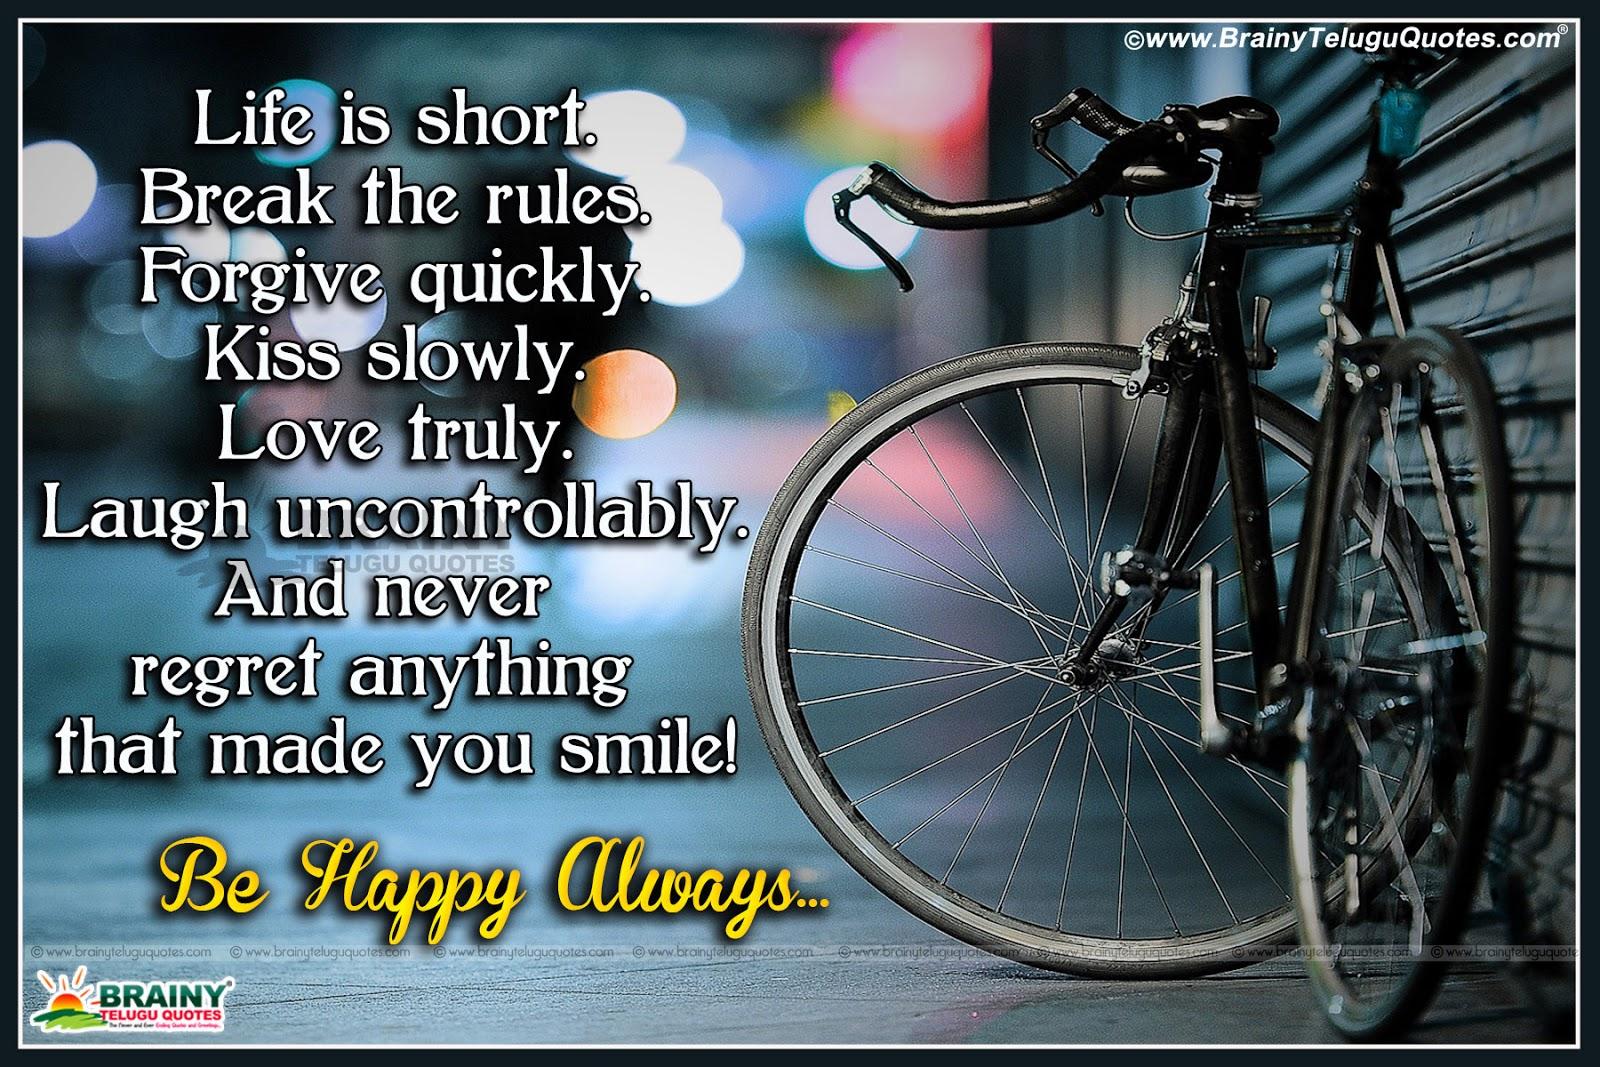 Happy Life Quotes In English Brainyteluguquotescomtelugu Quotes